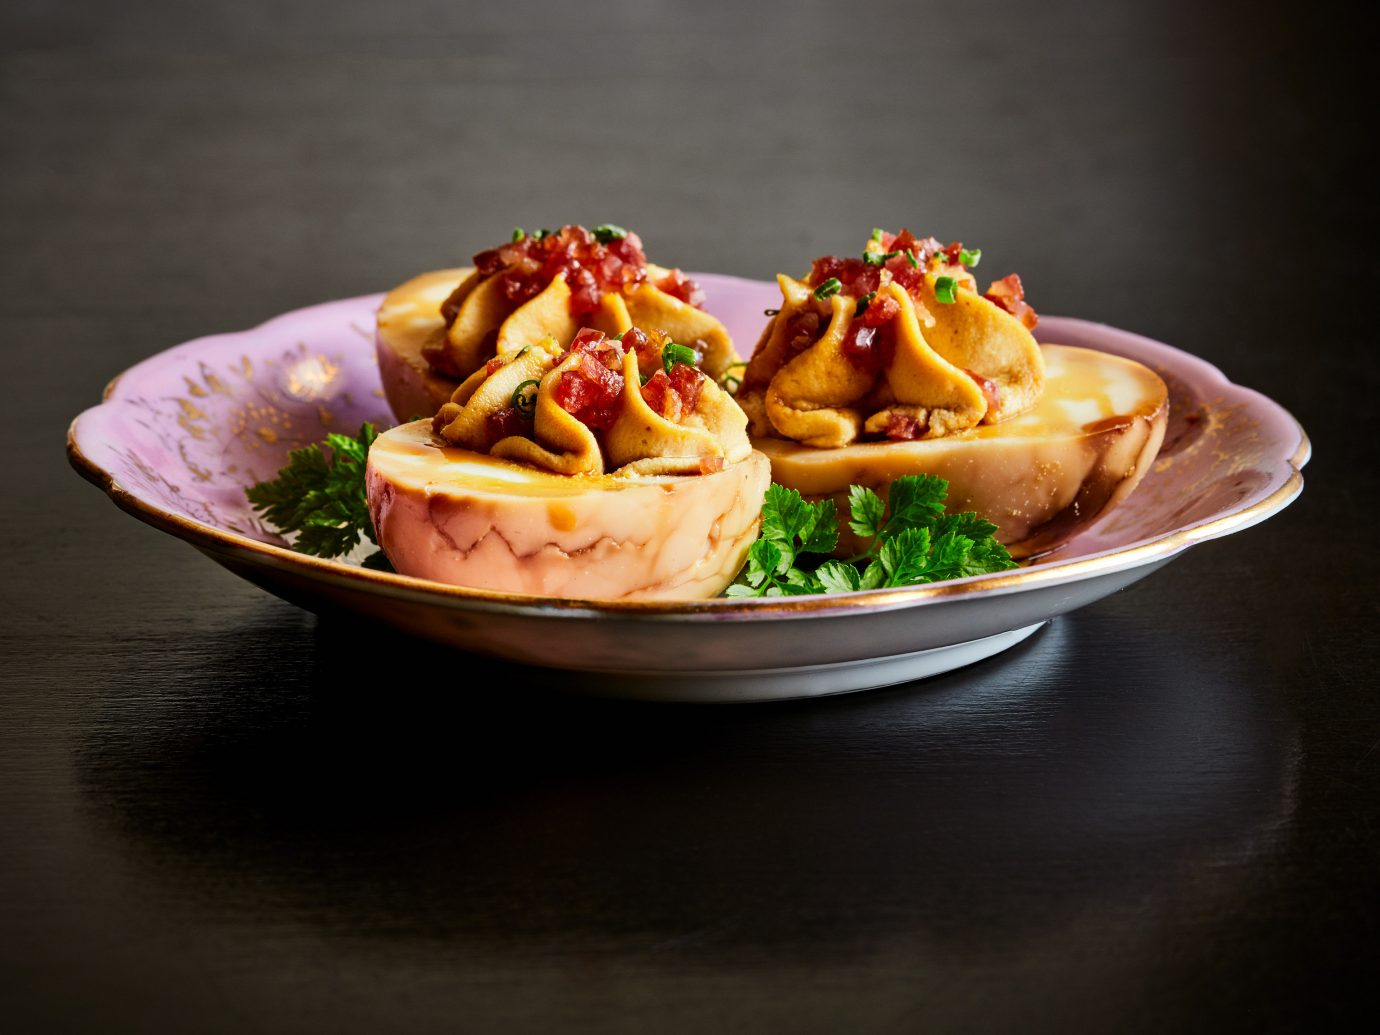 Food + Drink table food plate dish cuisine meal dessert produce breakfast